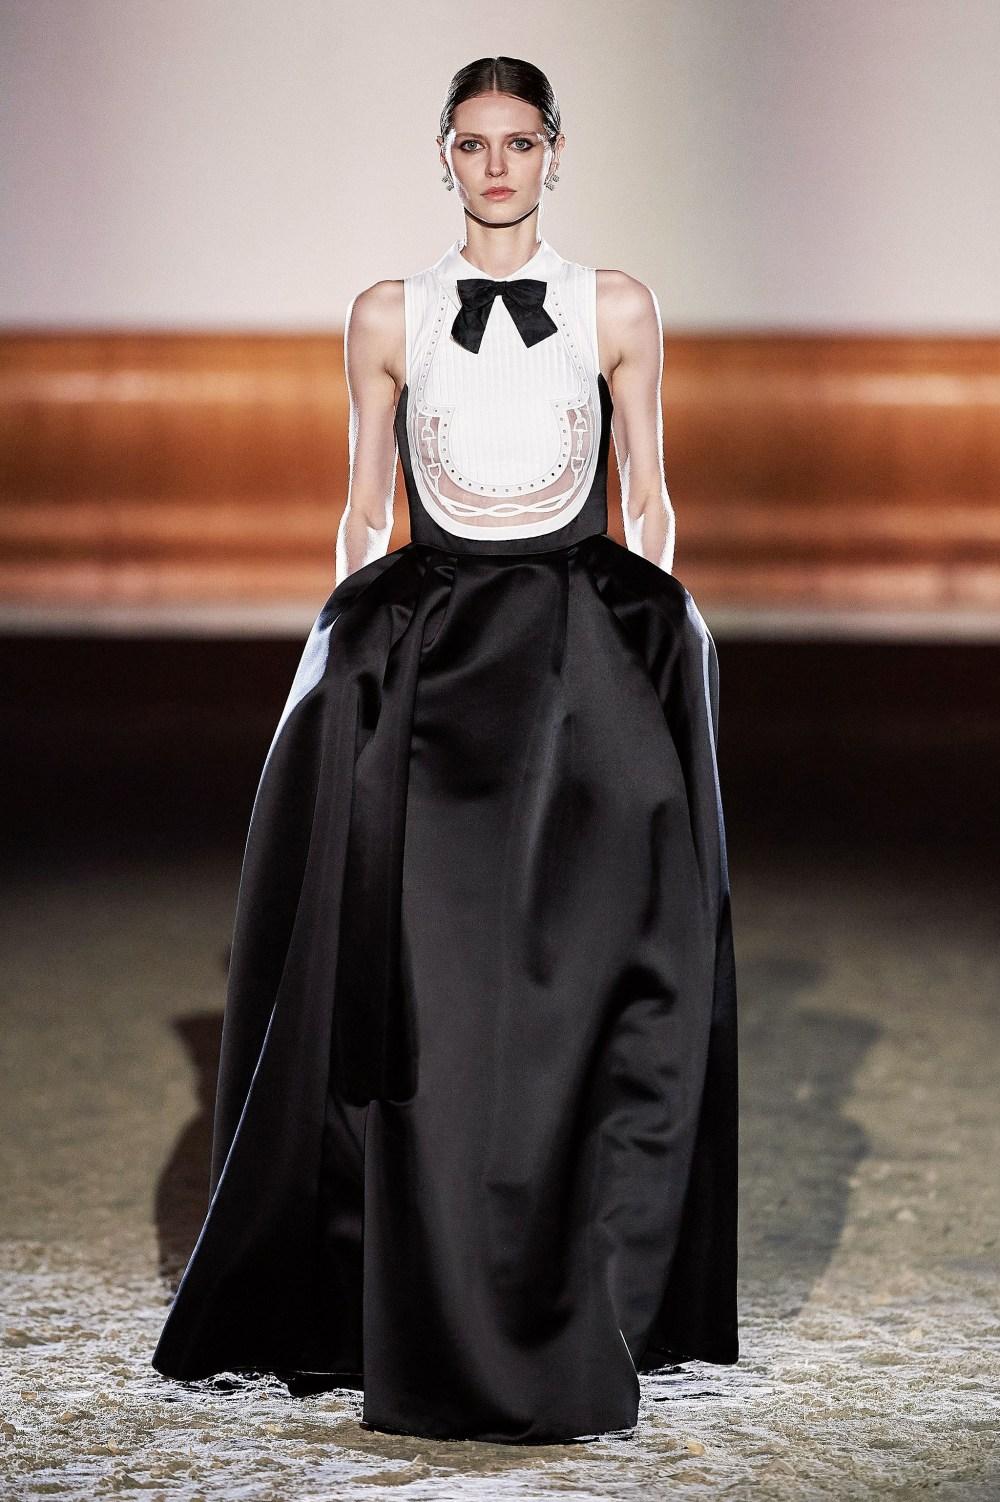 Elisabetta Franchi: Elisabetta Franchi Fall Winter 2021-22 Fashion Show Photo #60